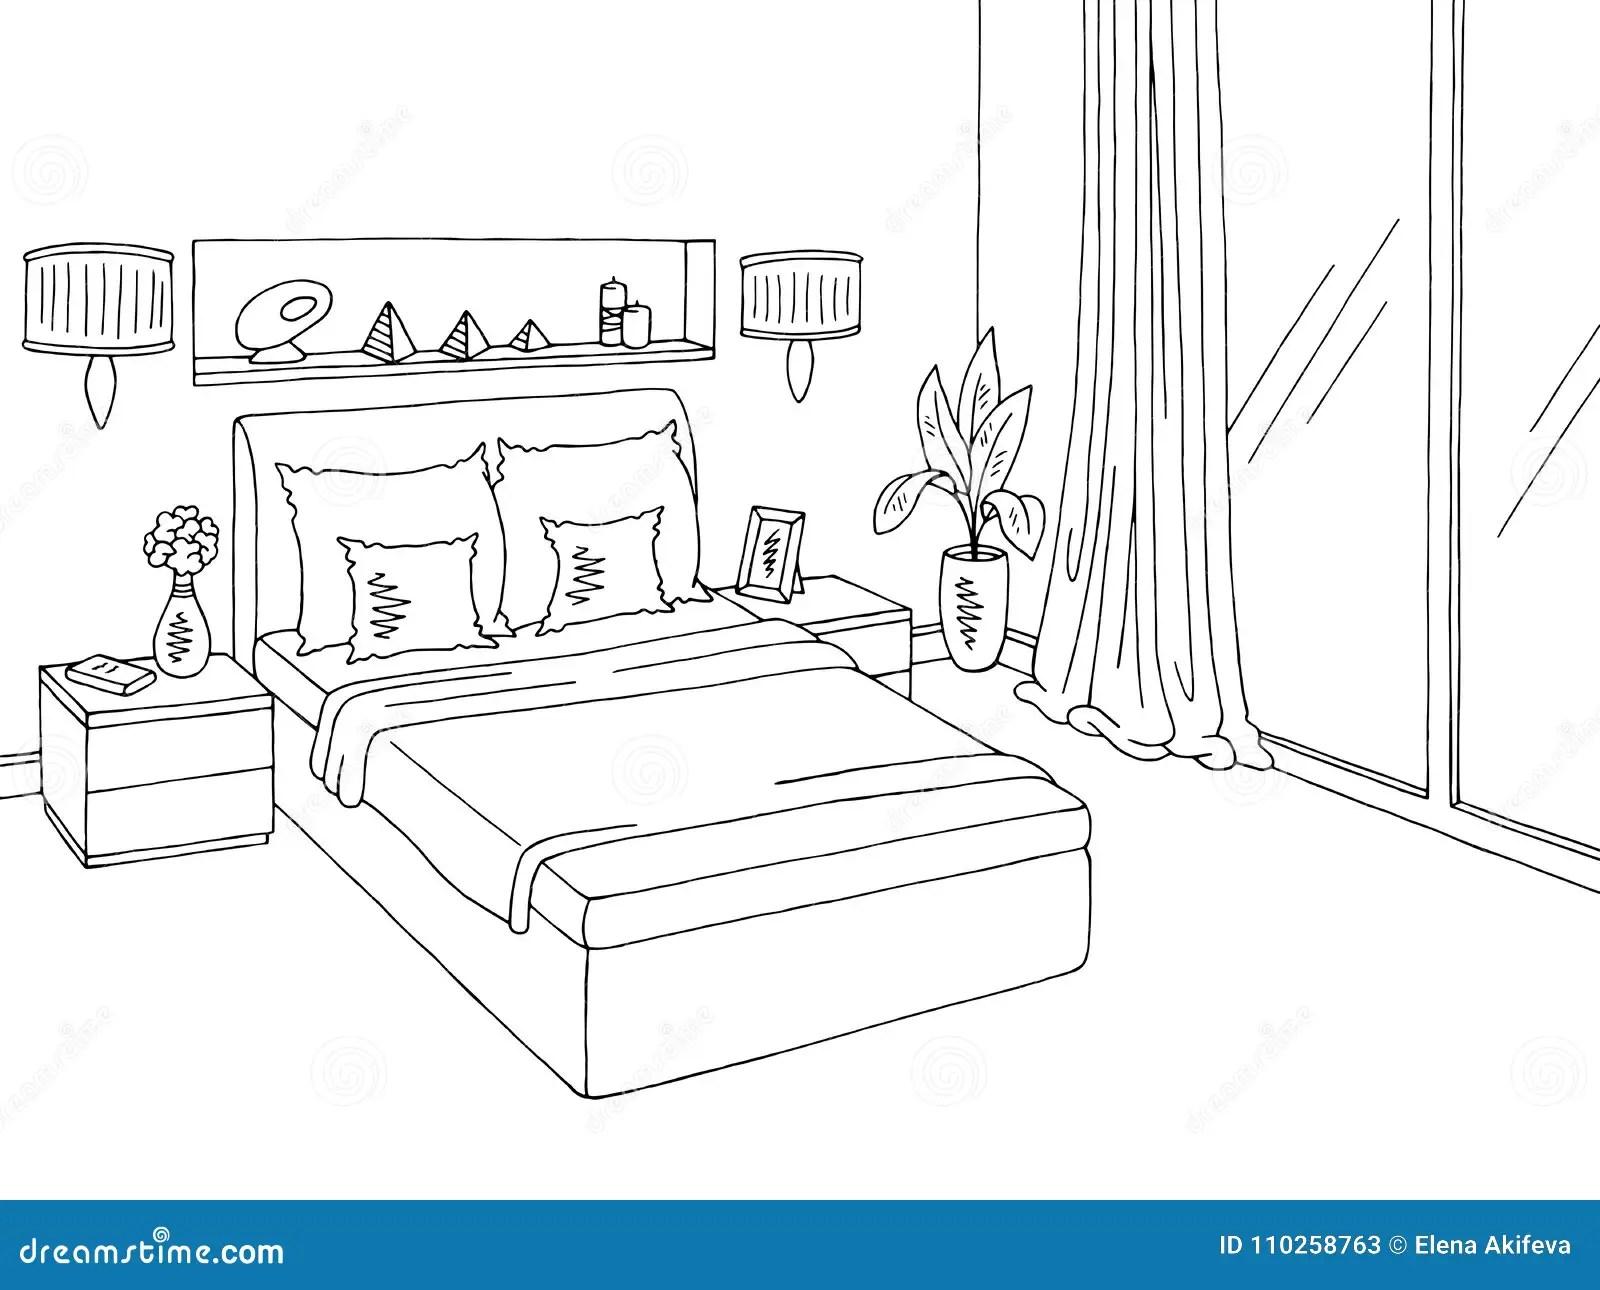 Bedroom Sketch Stock Illustrations 2 905 Bedroom Sketch